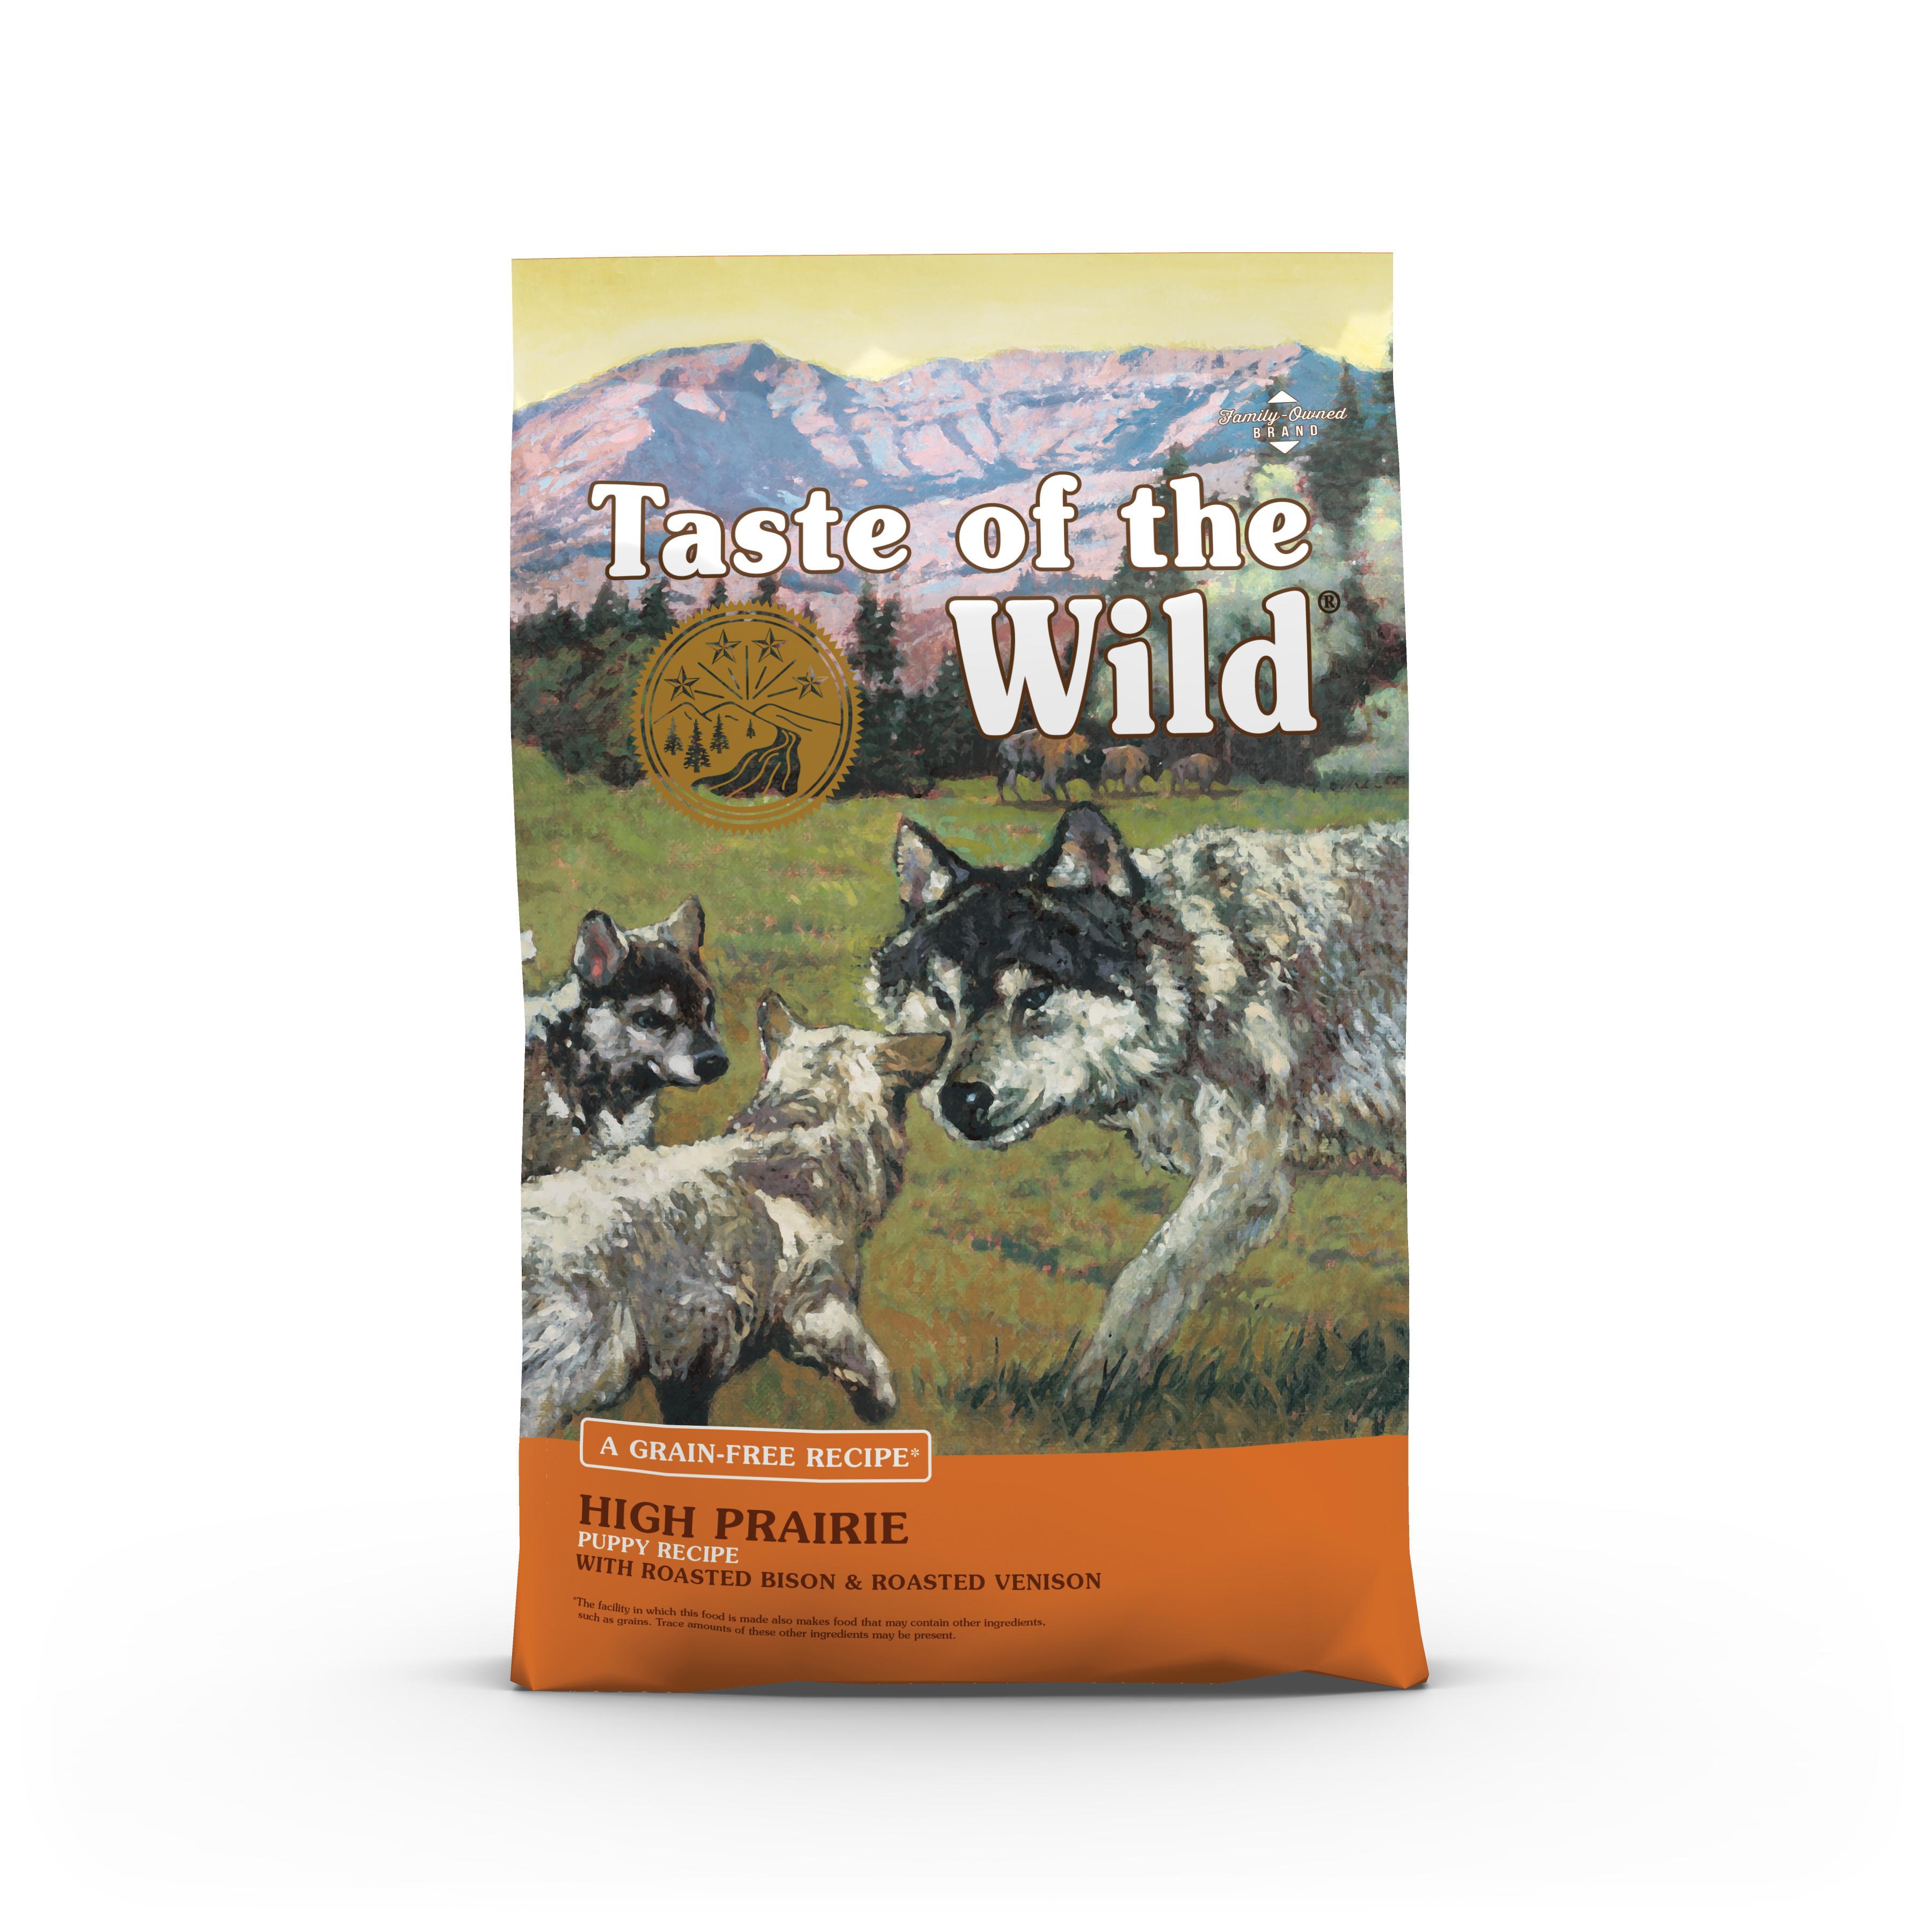 Taste of the Wild High Prairie Puppy Formula Grain-Free Dry Dog Food, 28-lb